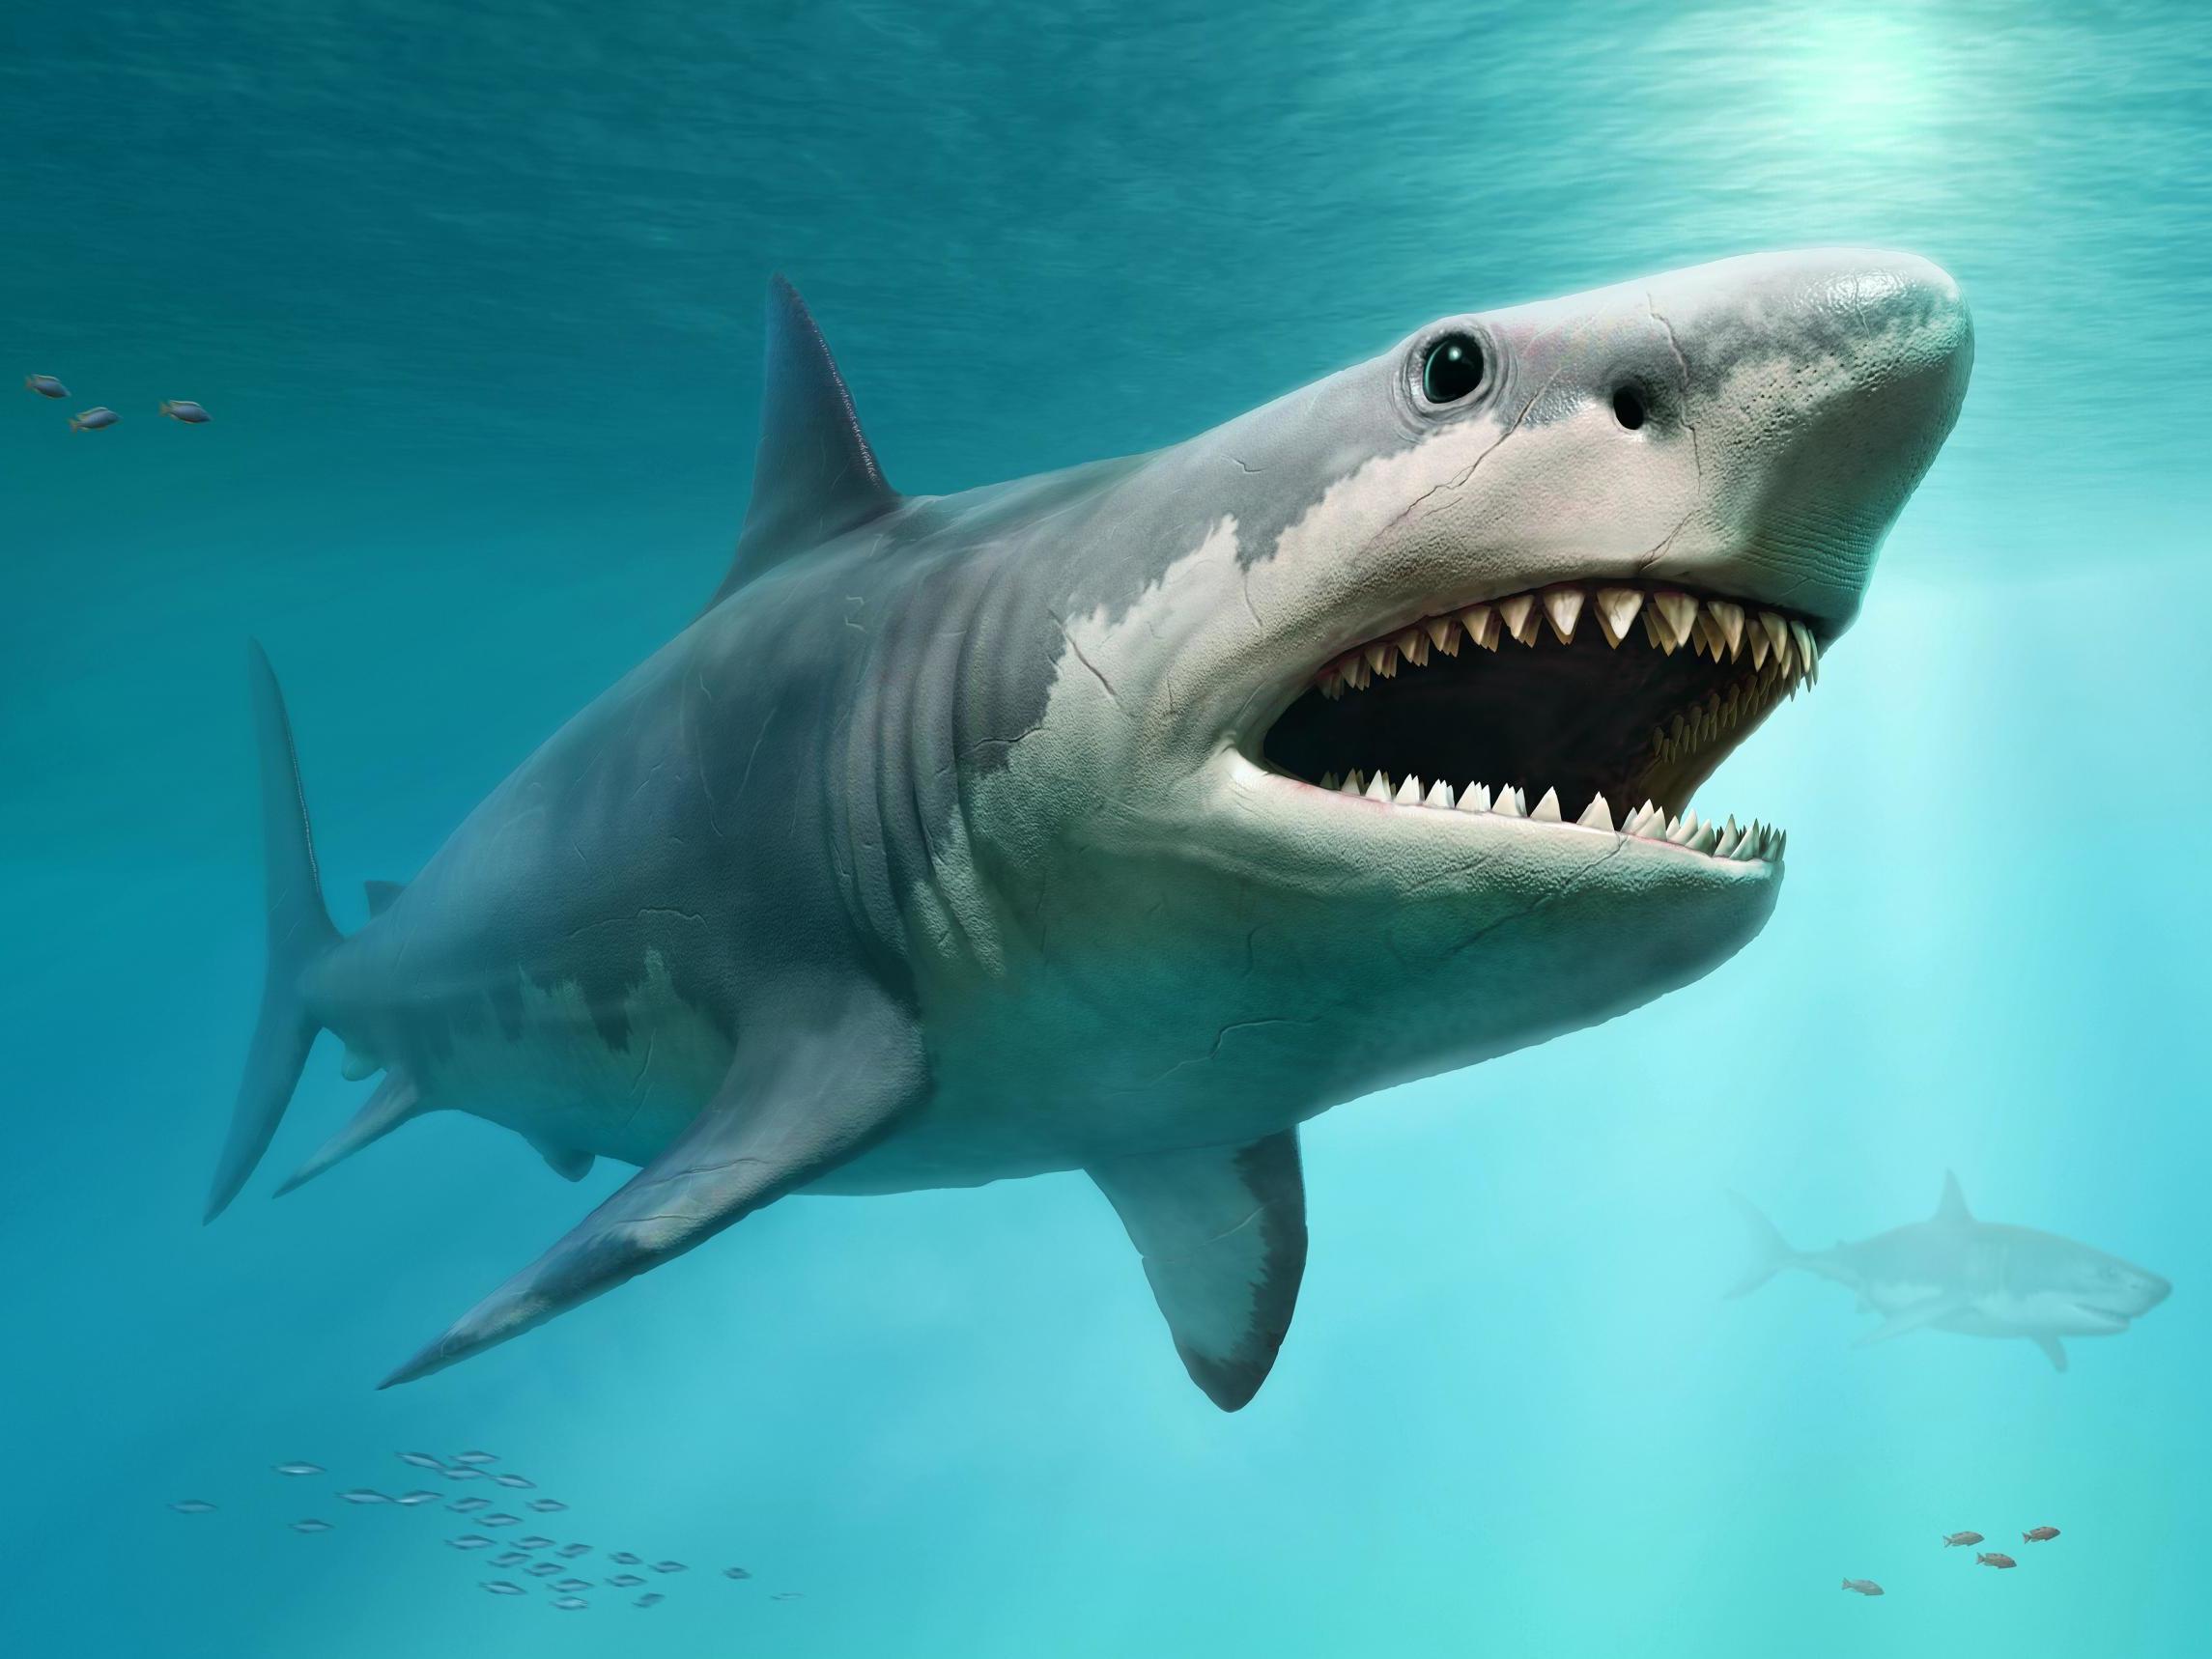 Megalodon: Mystery behind extinction of prehistoric 60ft